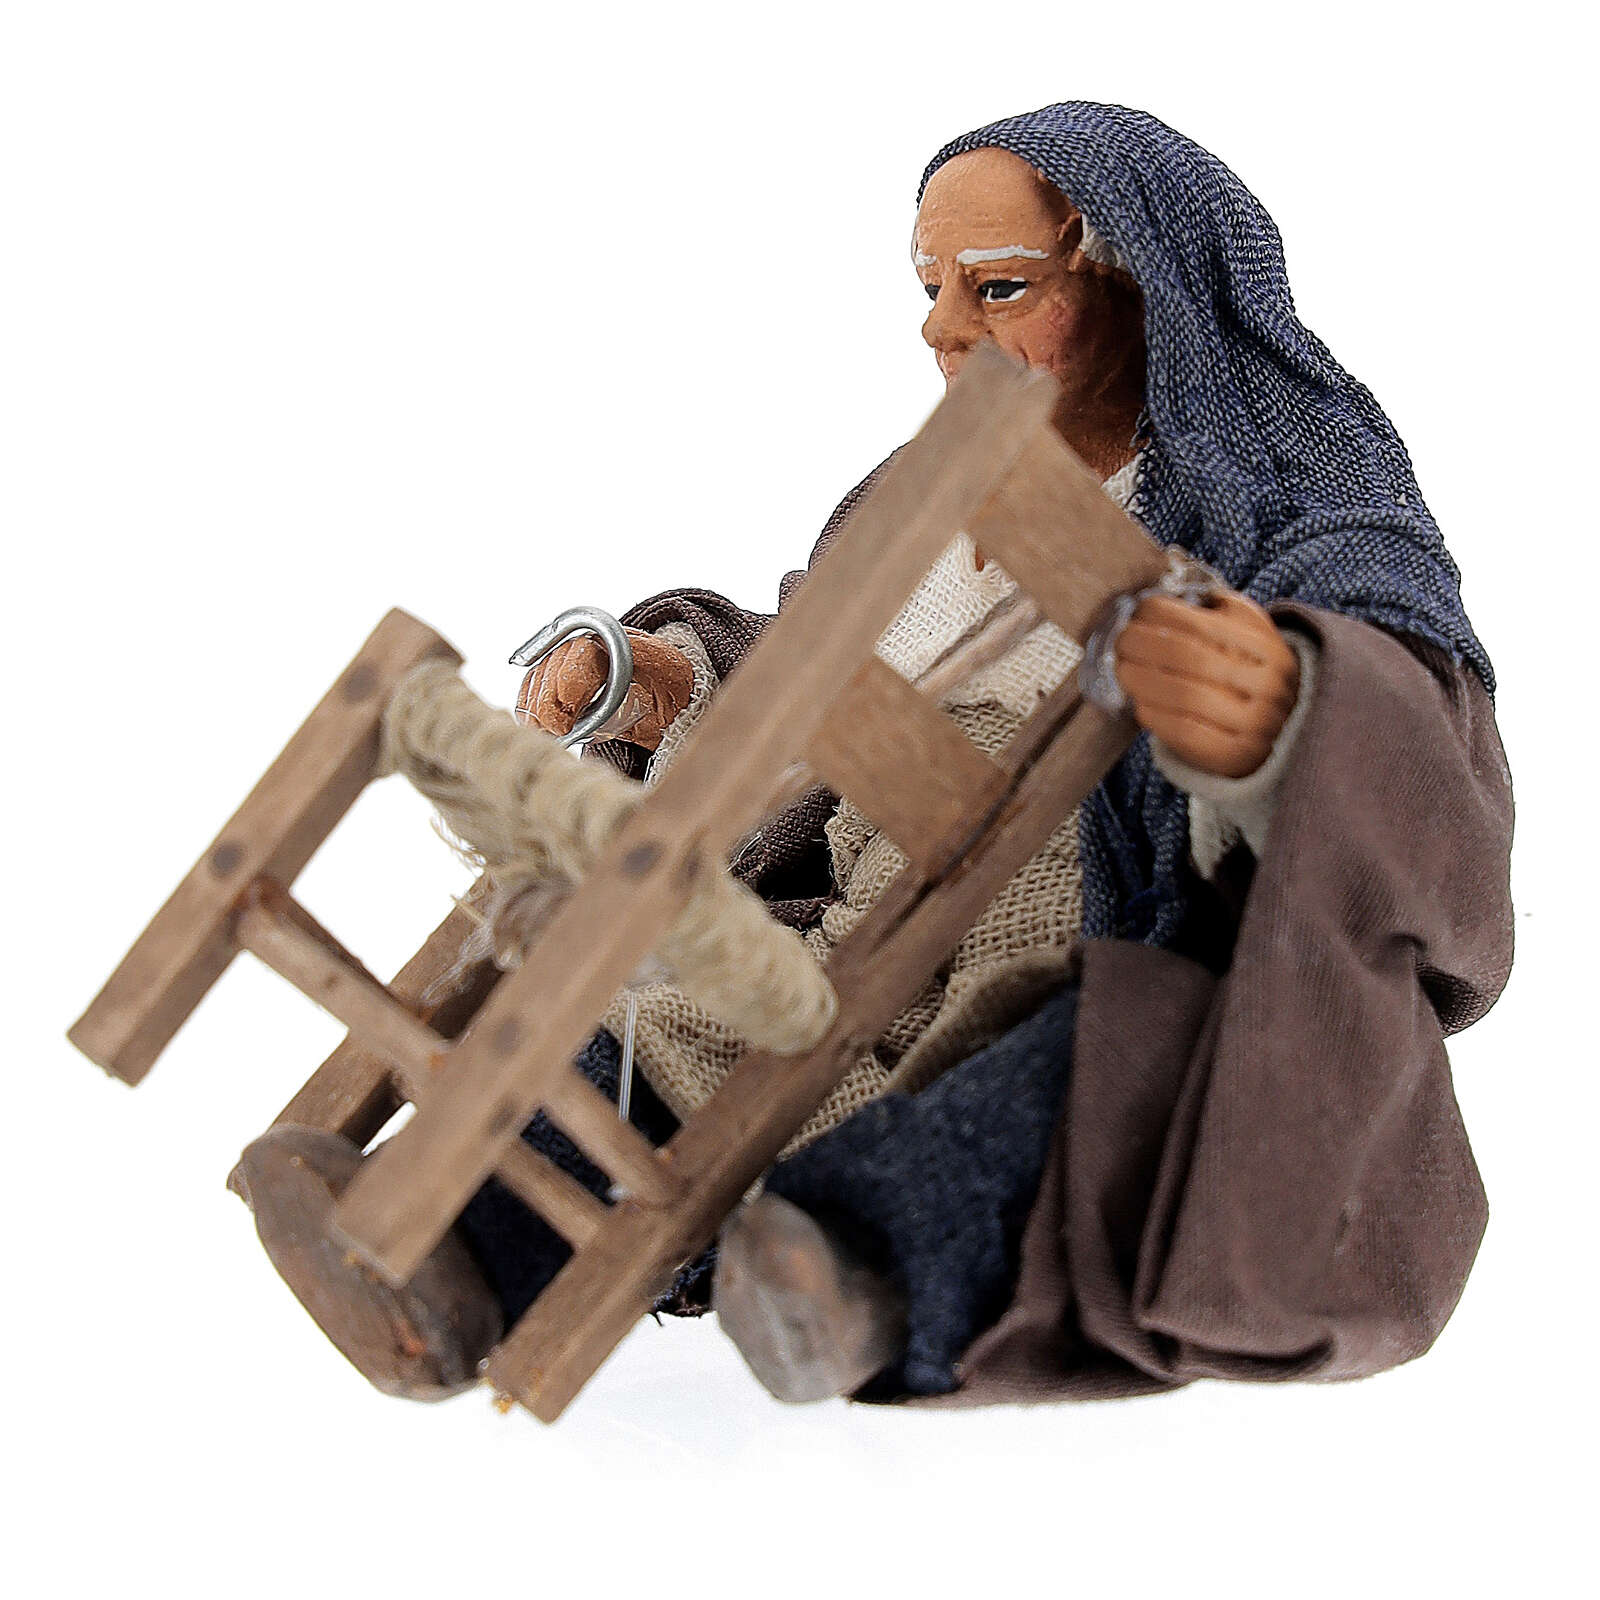 Riparatore di sedie seduto 10 cm presepe Napoli 4